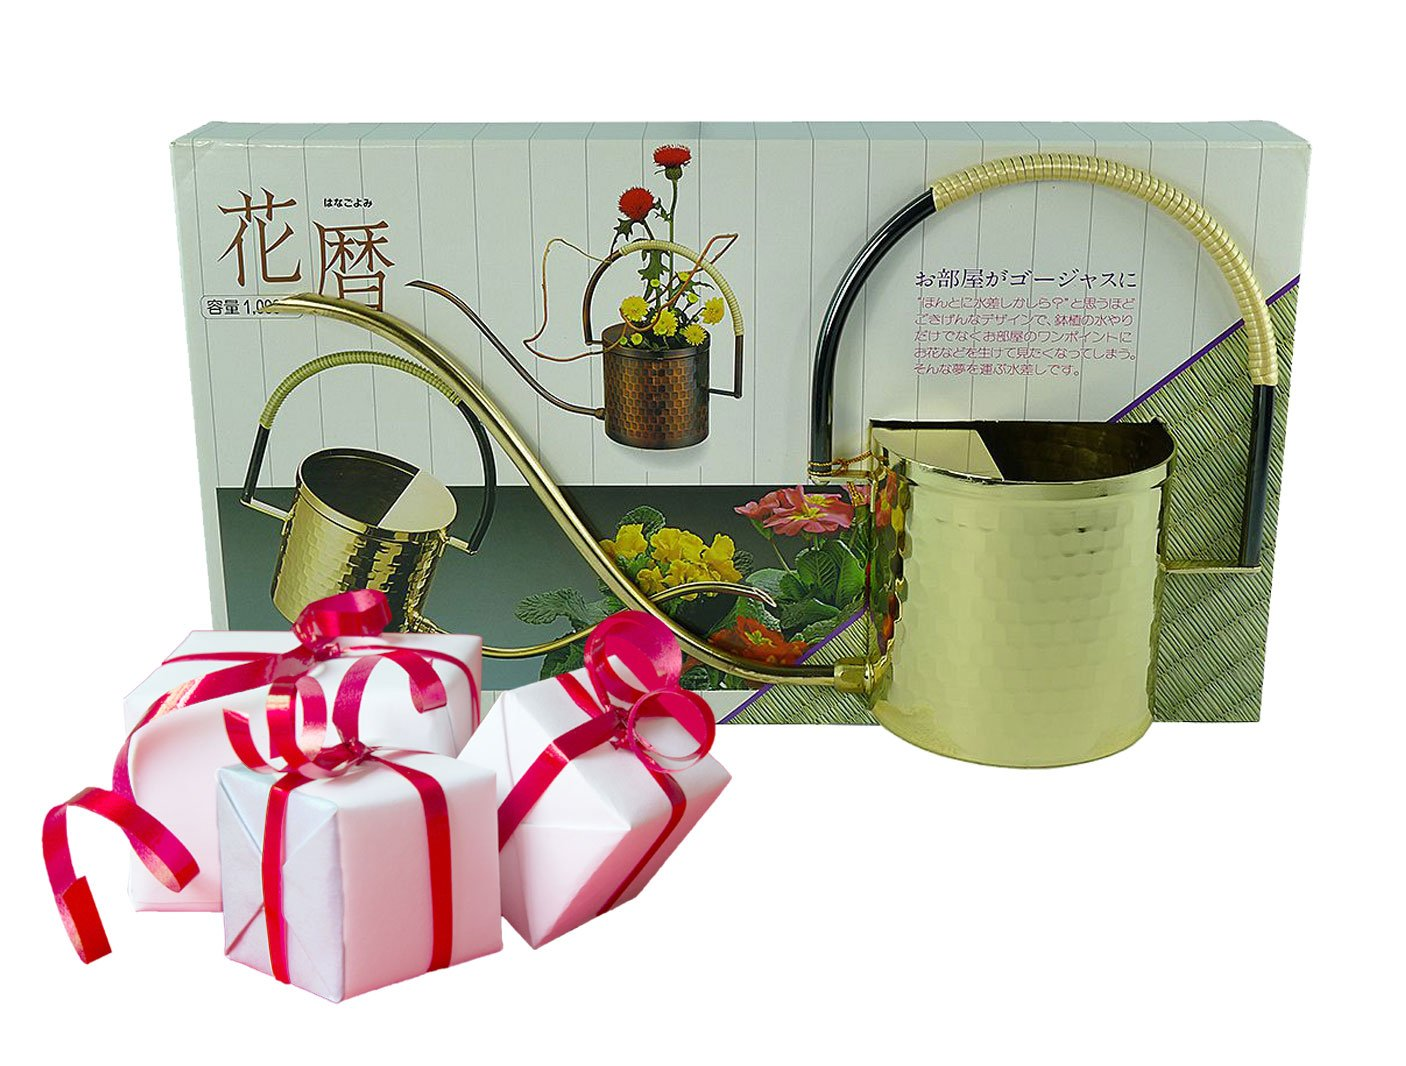 1 Quart Brass Watering Can - Handmade - Beautiful & Practical by Fujiyama